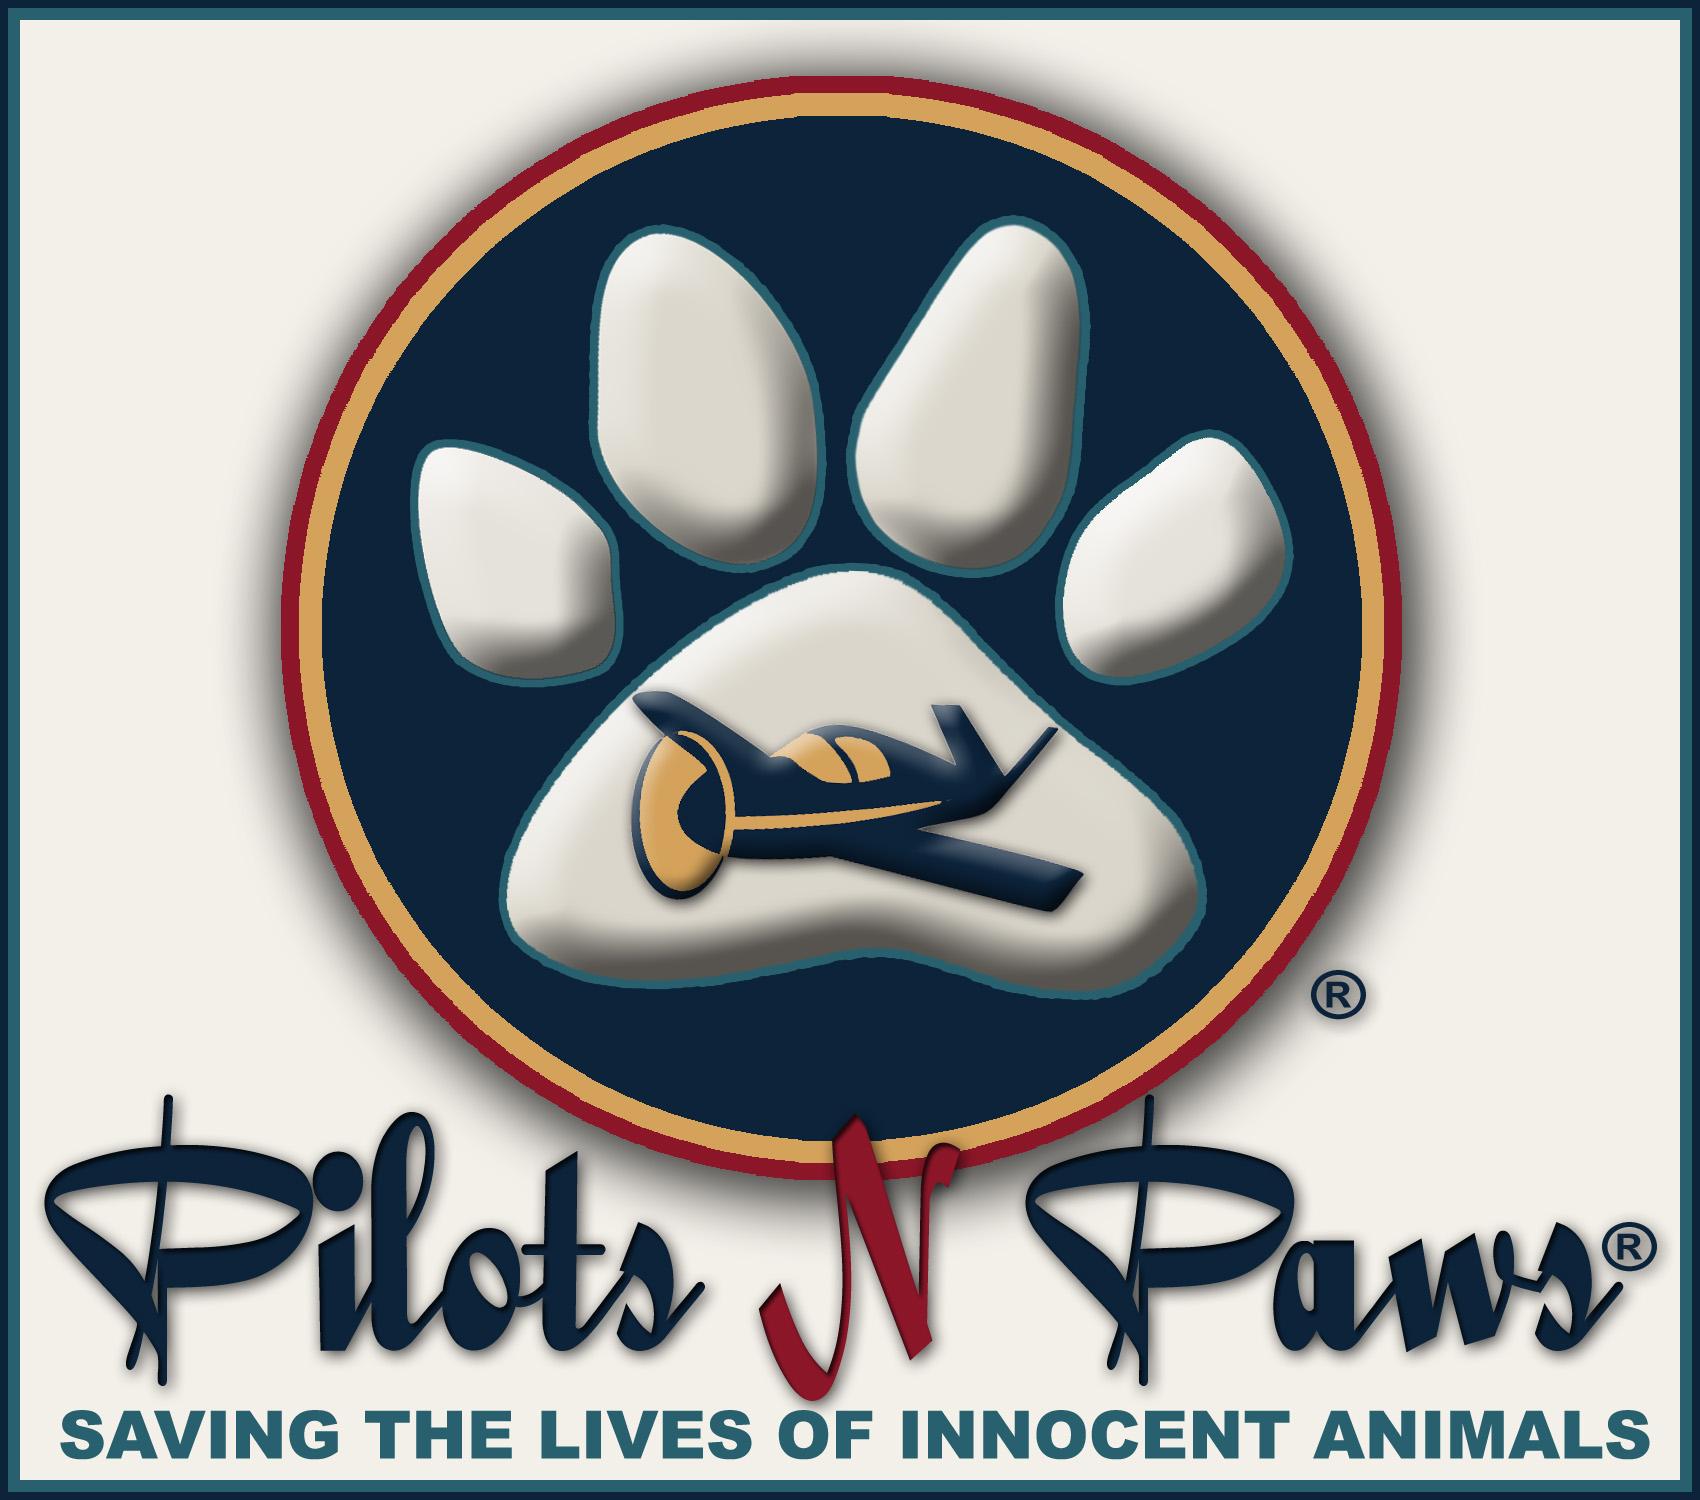 Sponsor Pilots & Paws